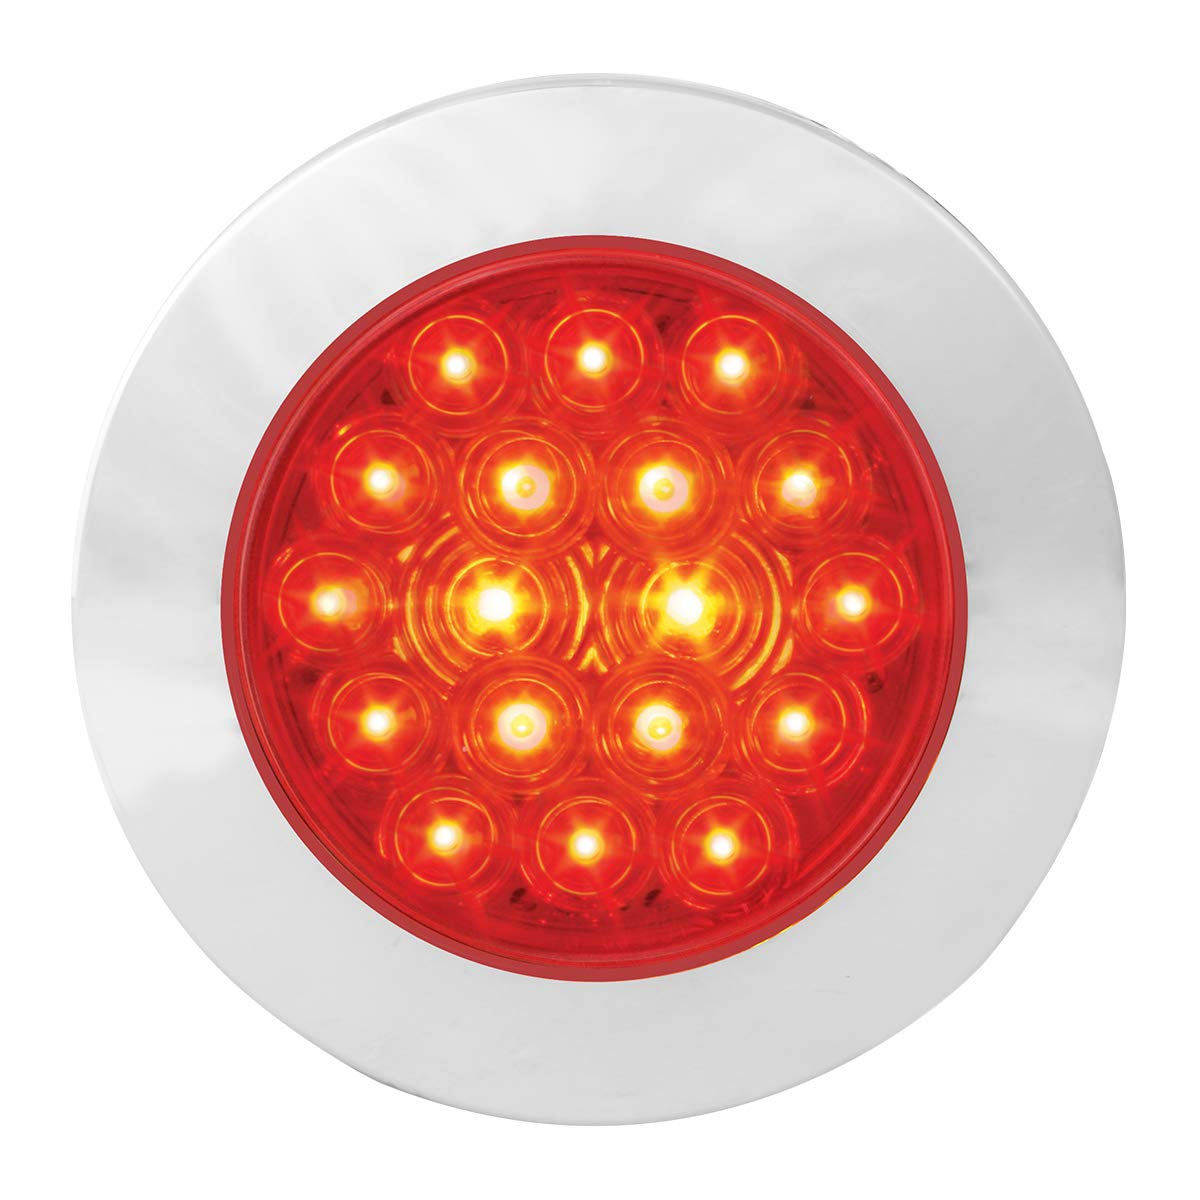 4 Fleet Red 18 Flange Mount with Bezel, 3 Wires Grand General 75882 LED Light